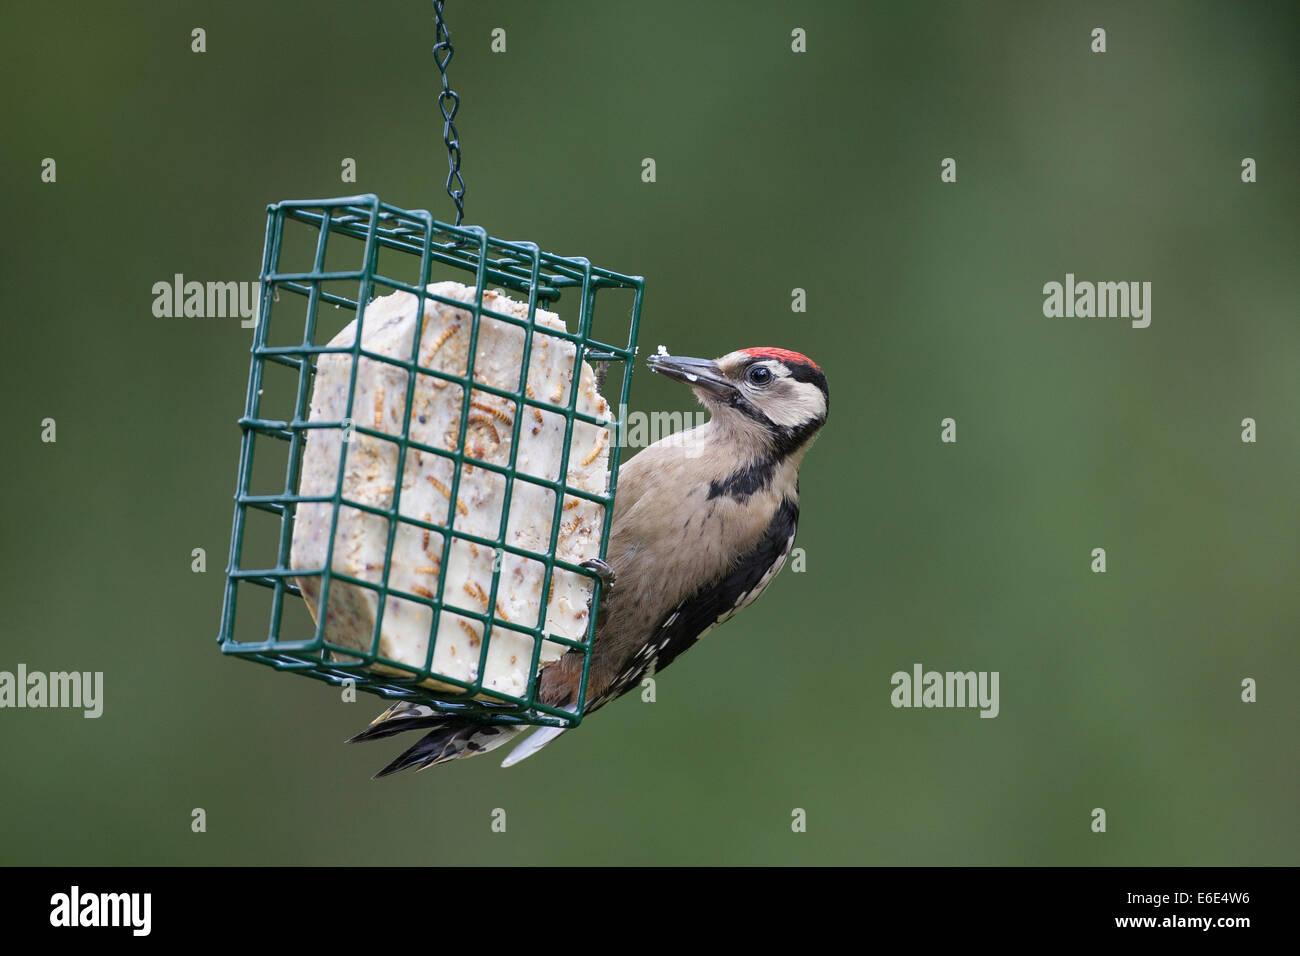 Great Spotted Woodpecker, bird's feeding, Buntspecht, Vogelfütterung, Vogelfutter, Dendrocopos major, Vogelfutter, - Stock Image